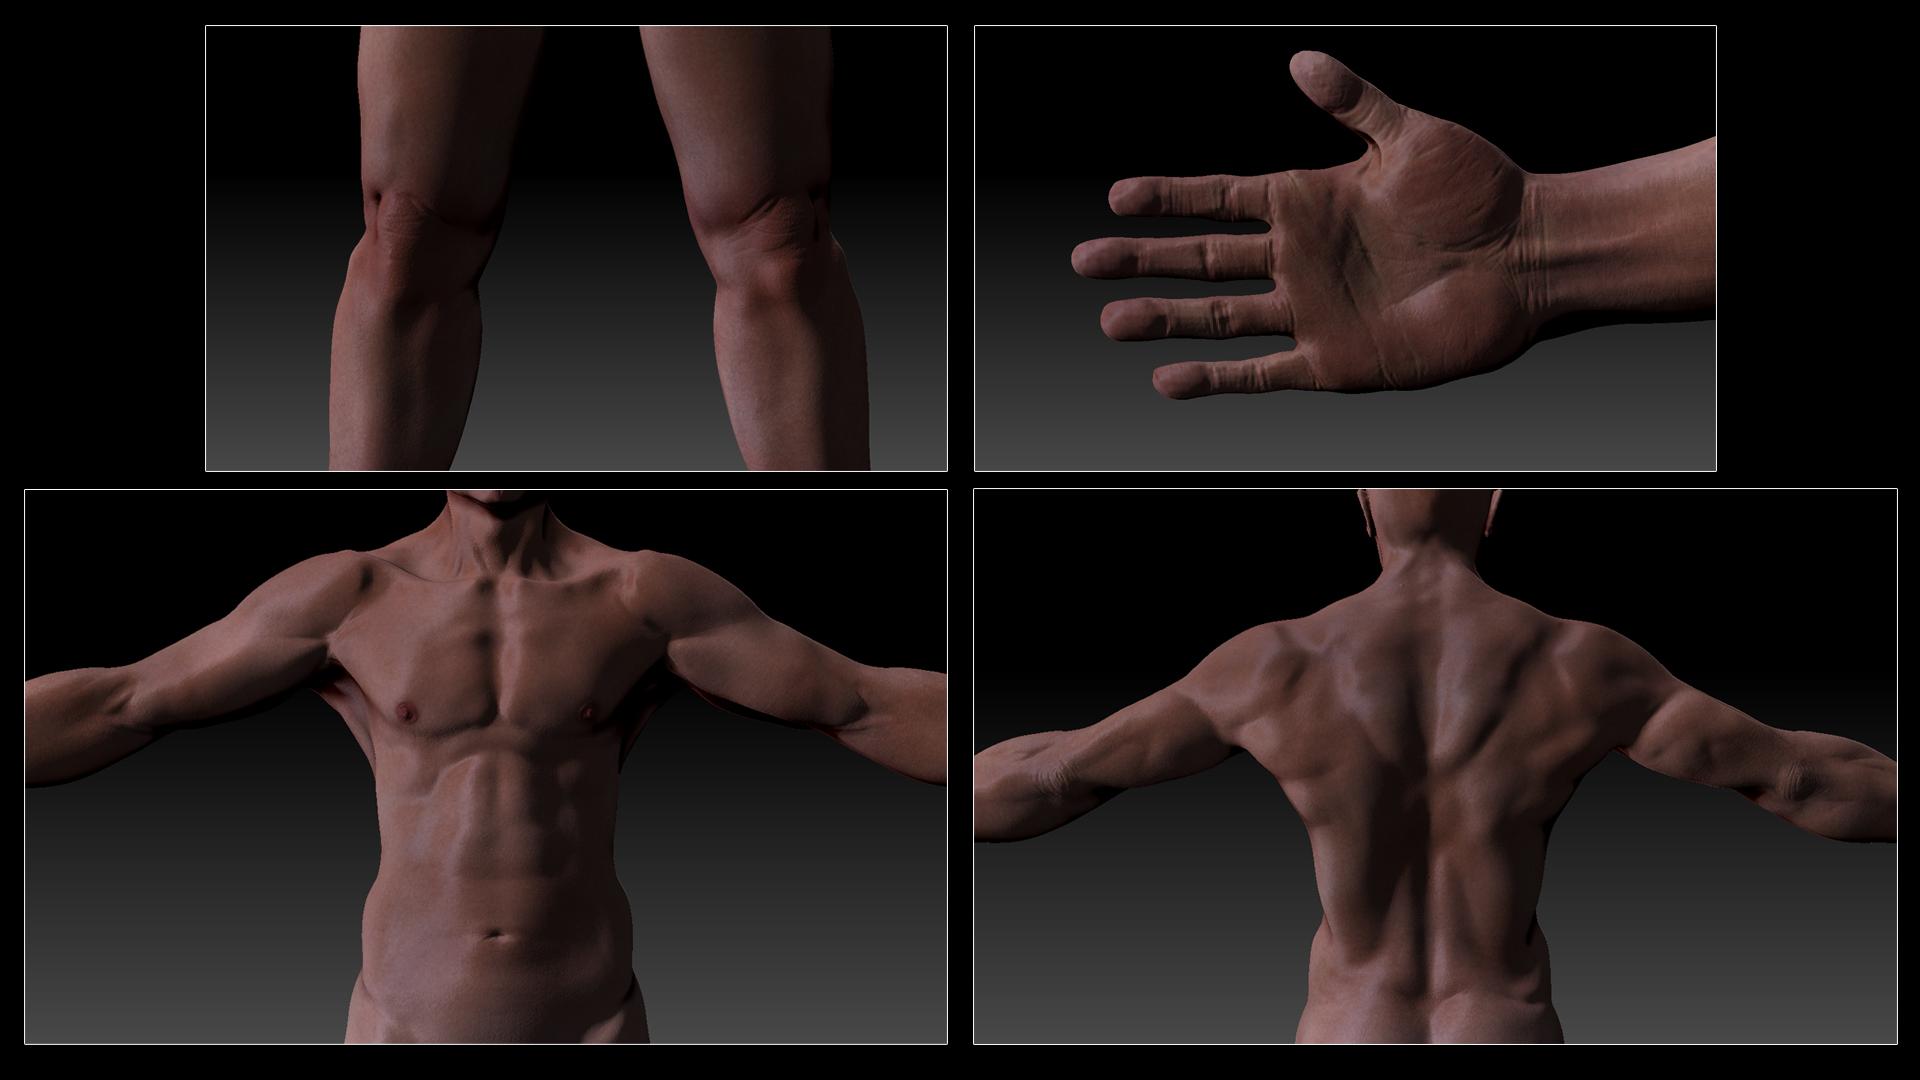 AnatomyStudyMale